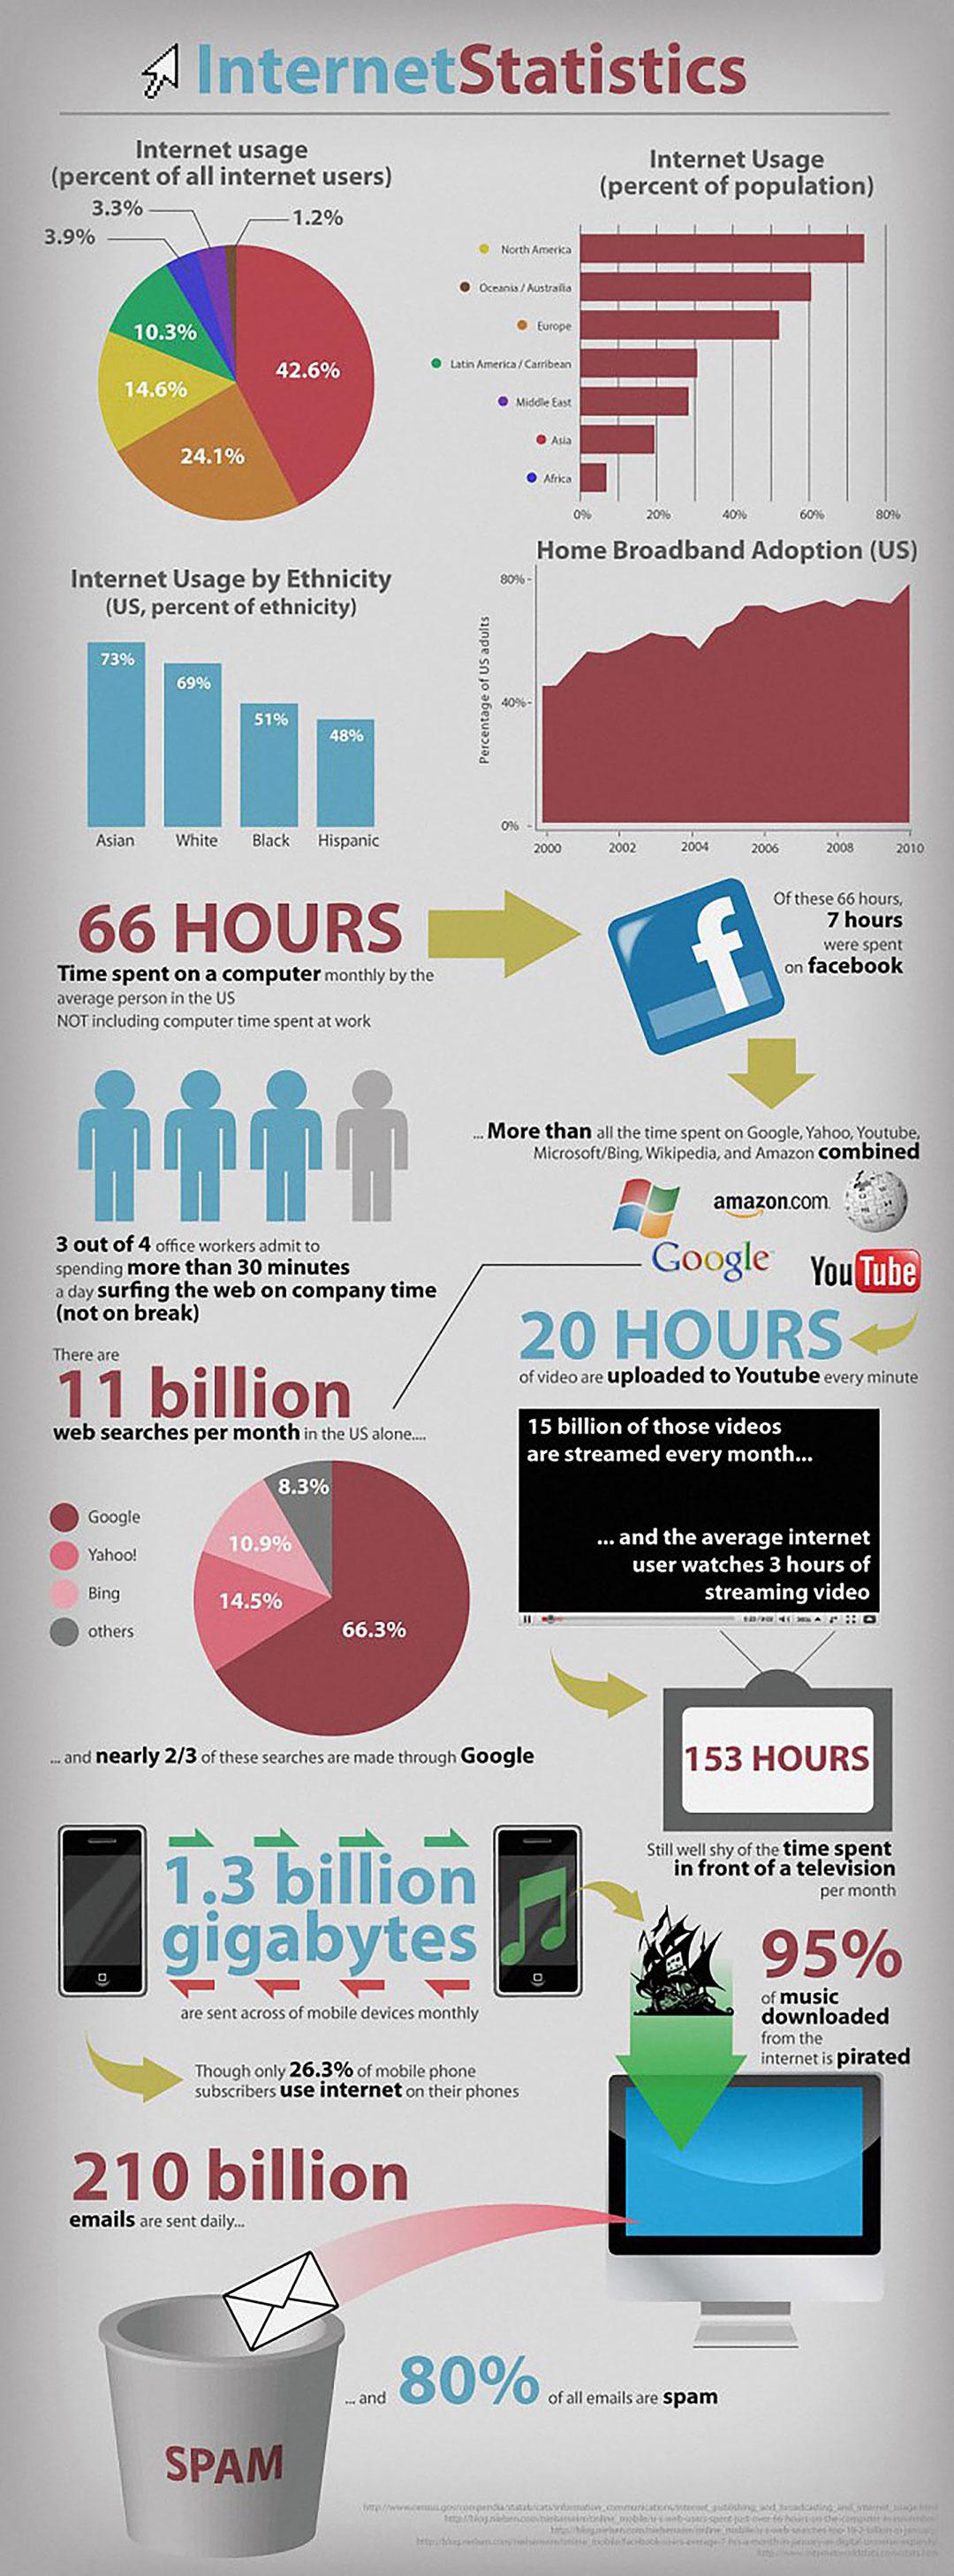 Internet-Infographic---02